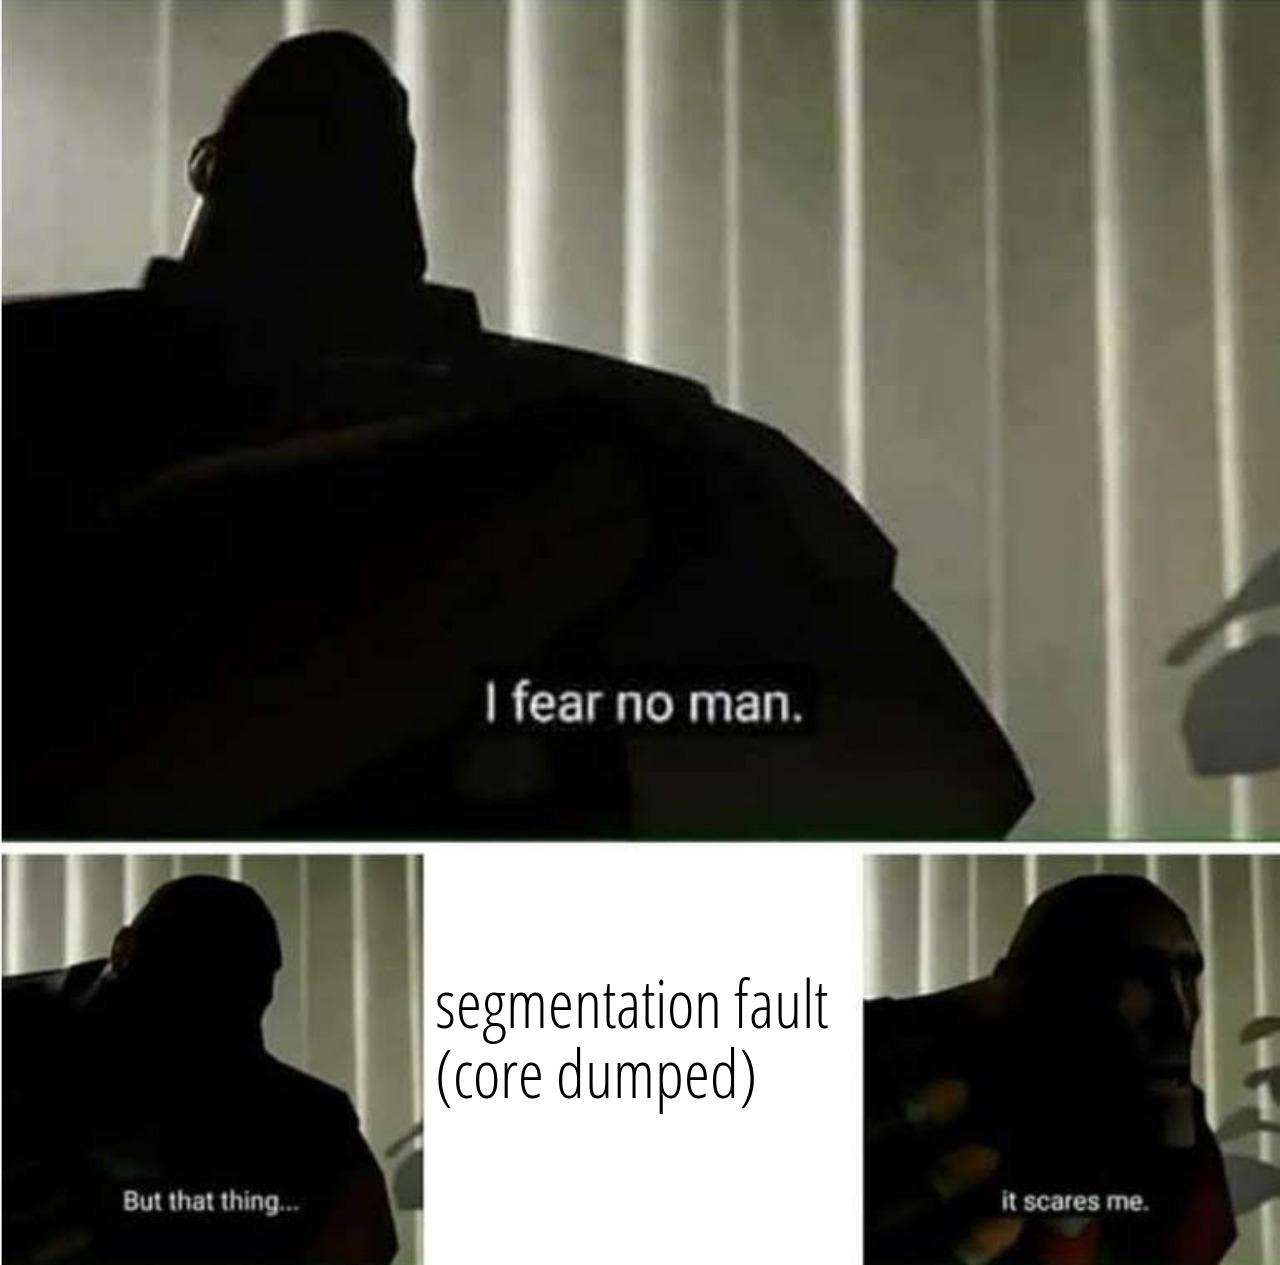 humor/fear_segfault.jpeg